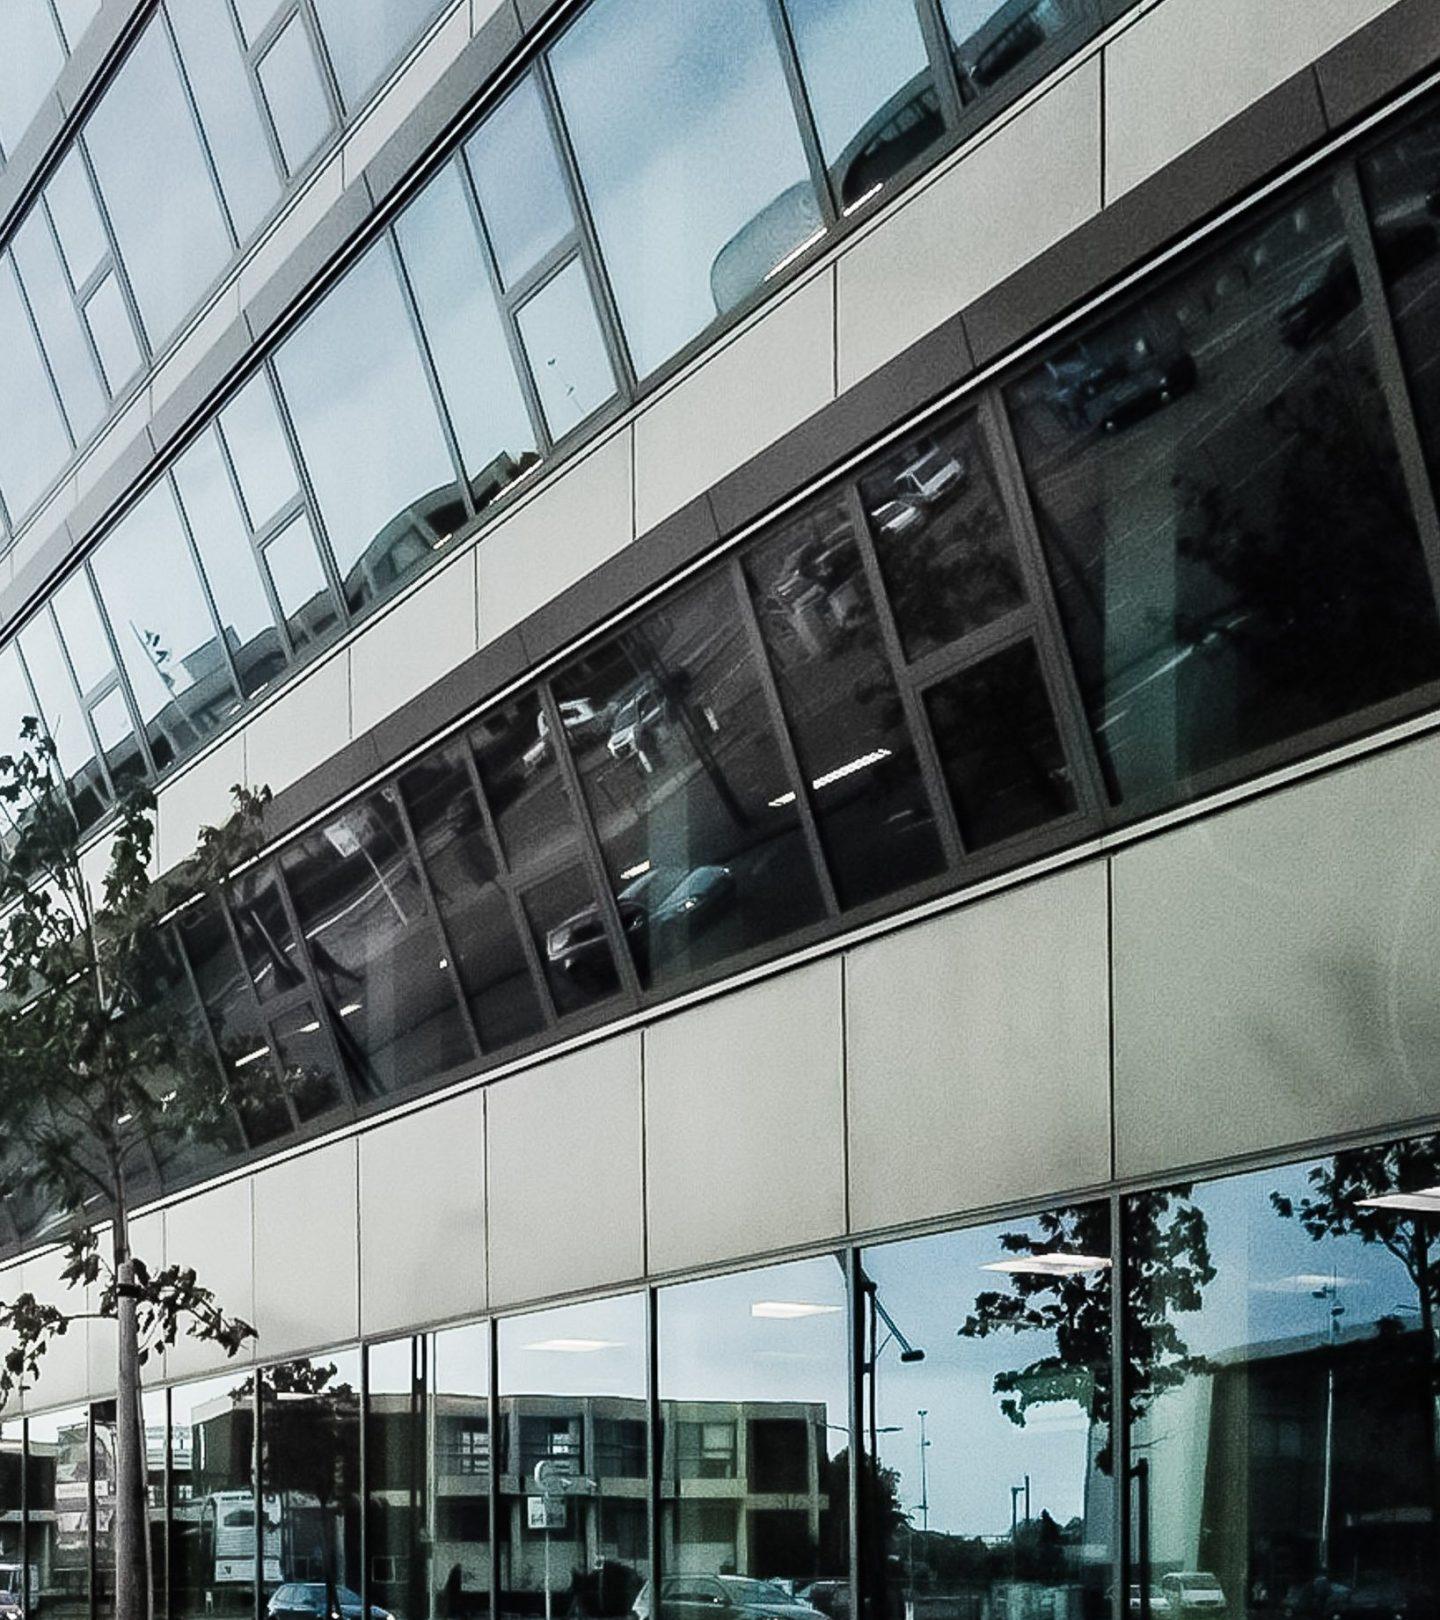 Industrieplein Hengelo - Fassade